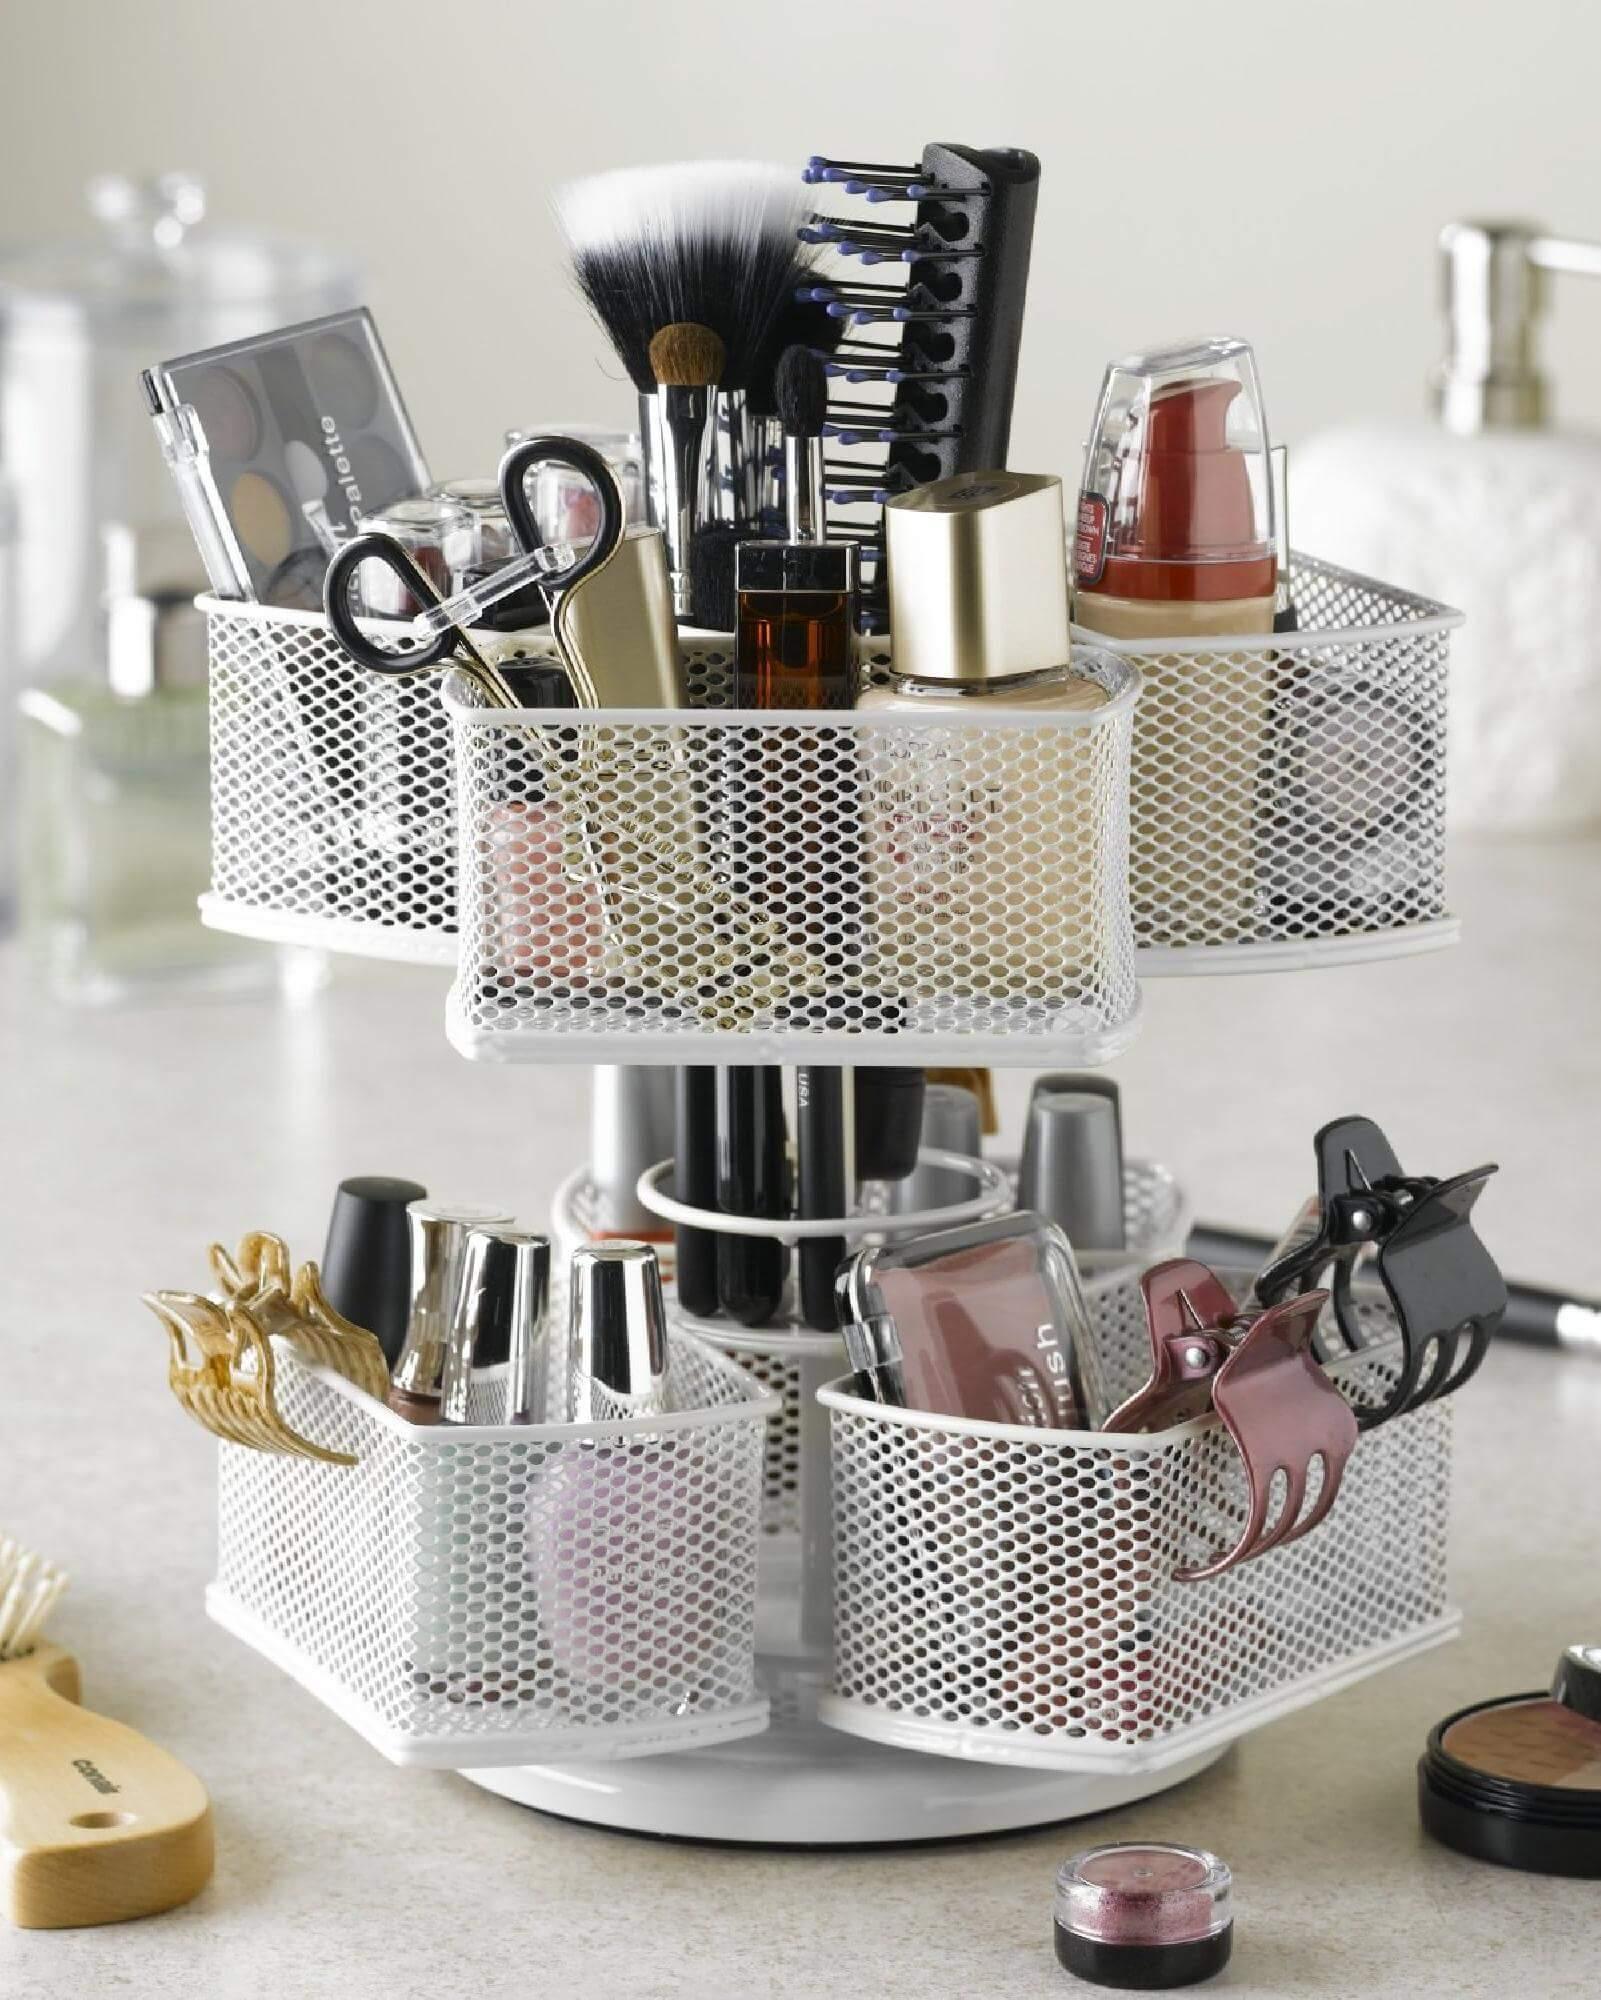 29-small-bathroom-storage-ideas-homebnc